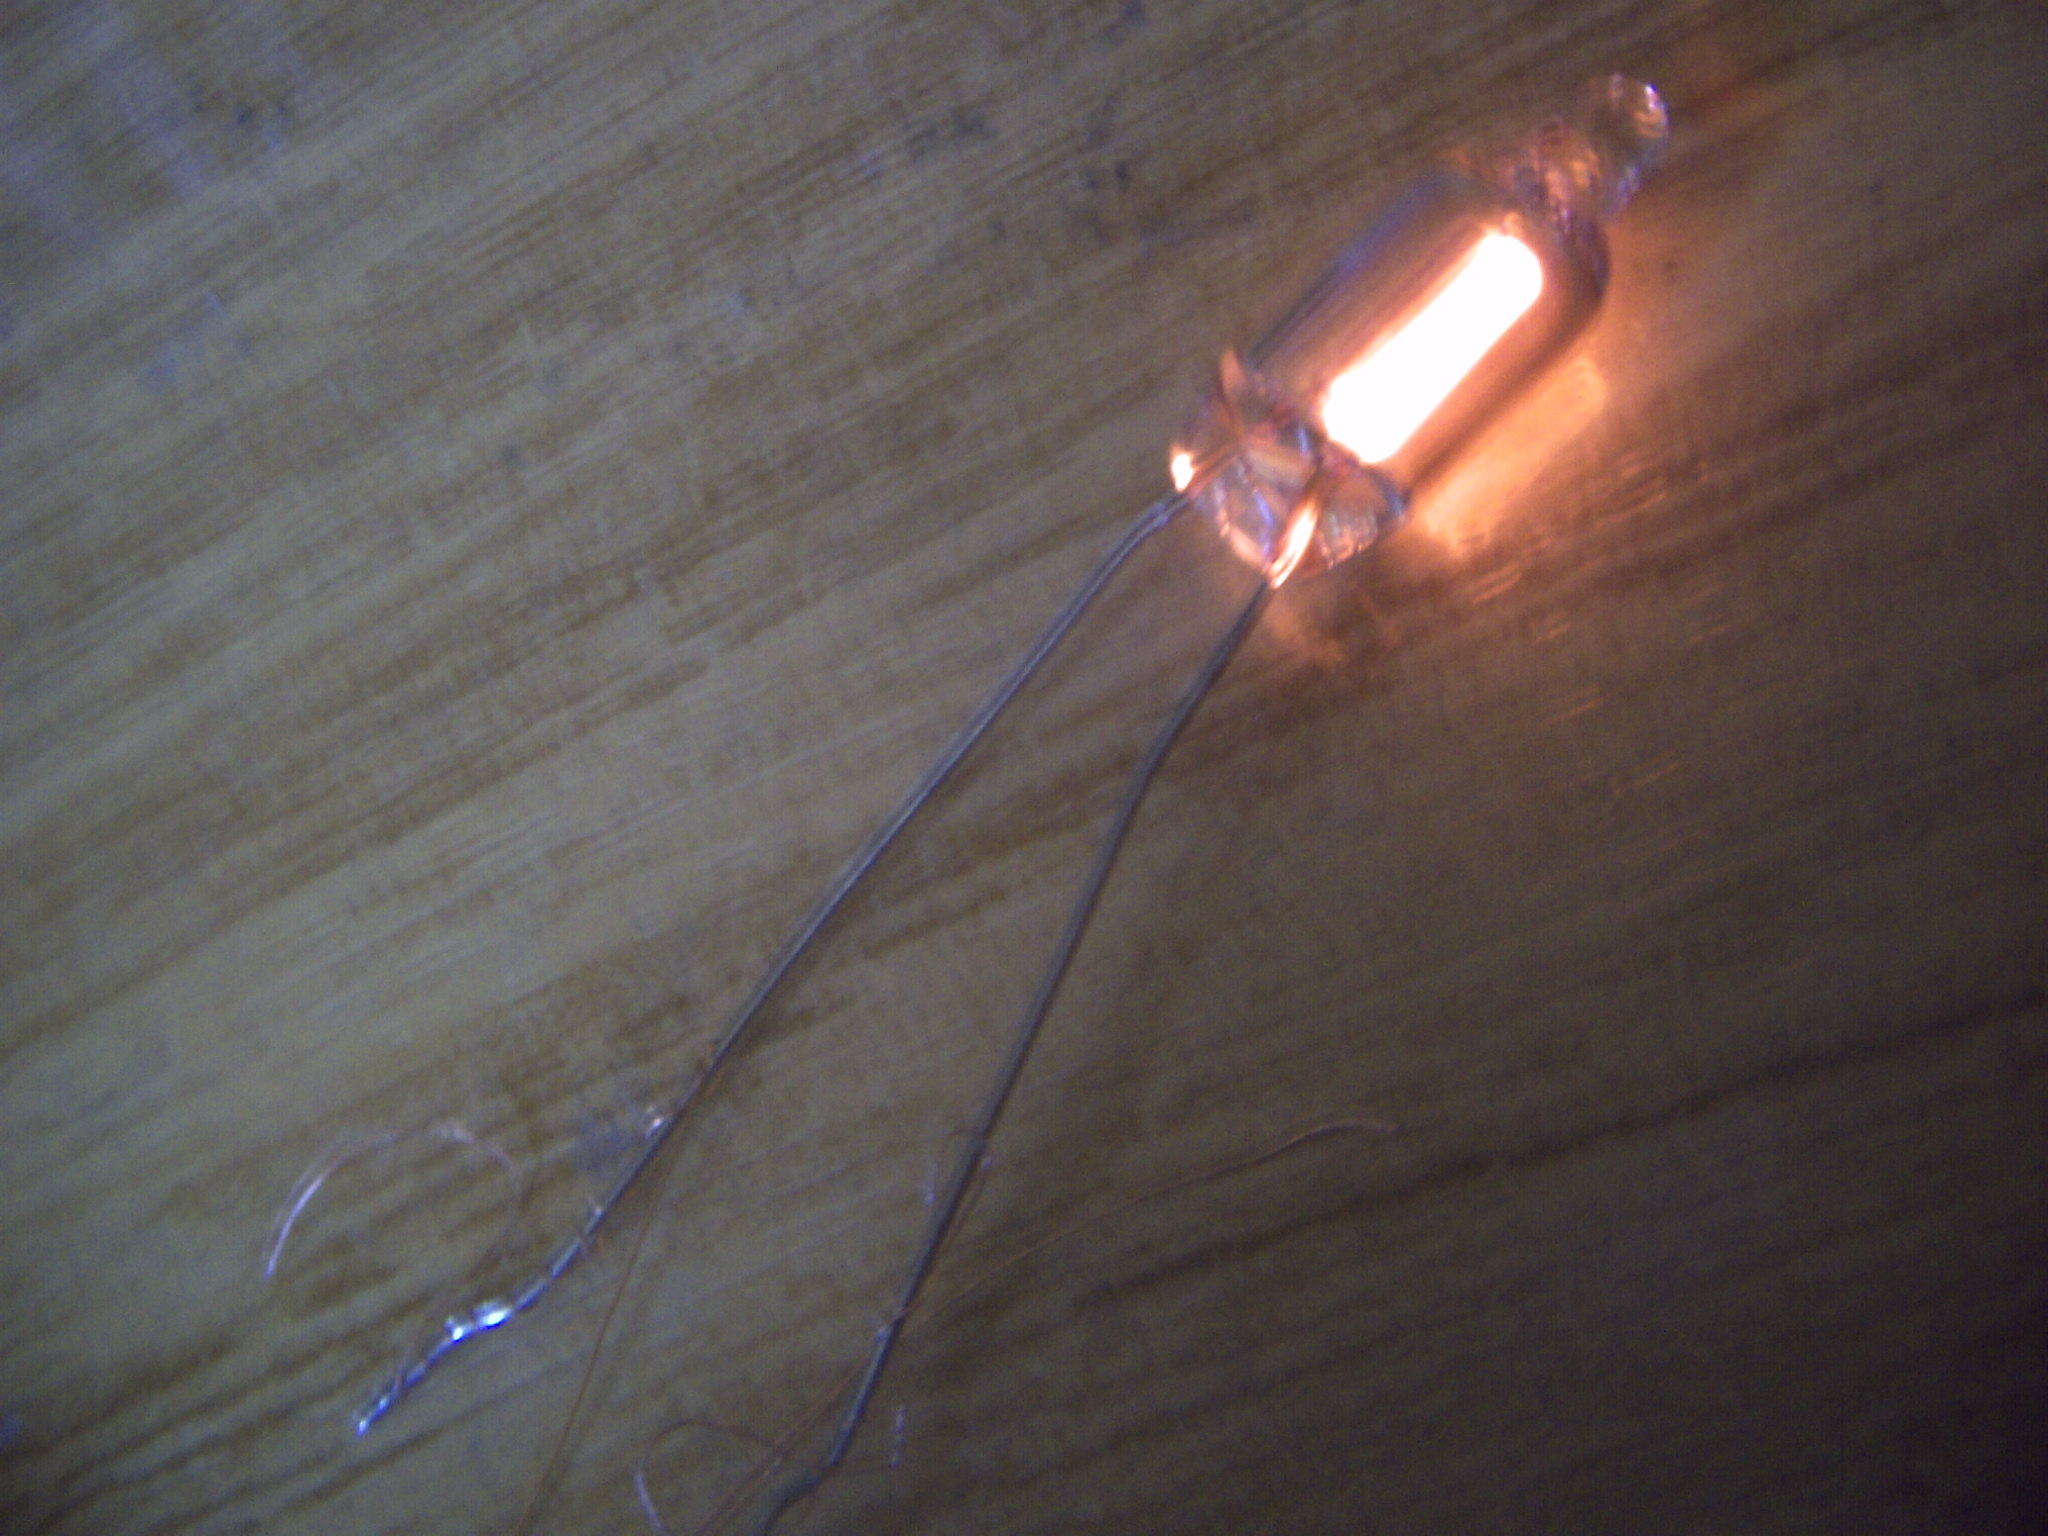 high voltage joule thief!